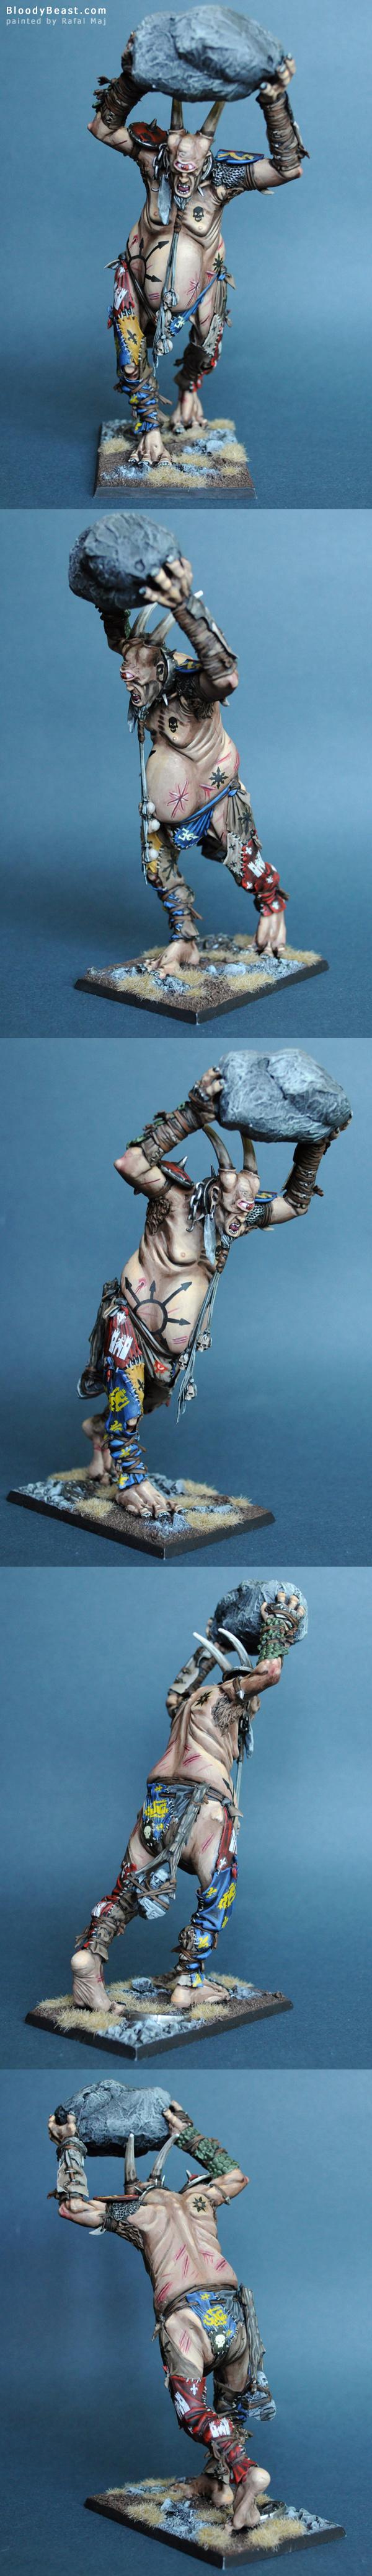 Beastmen Cygor painted by Rafal Maj (BloodyBeast.com)